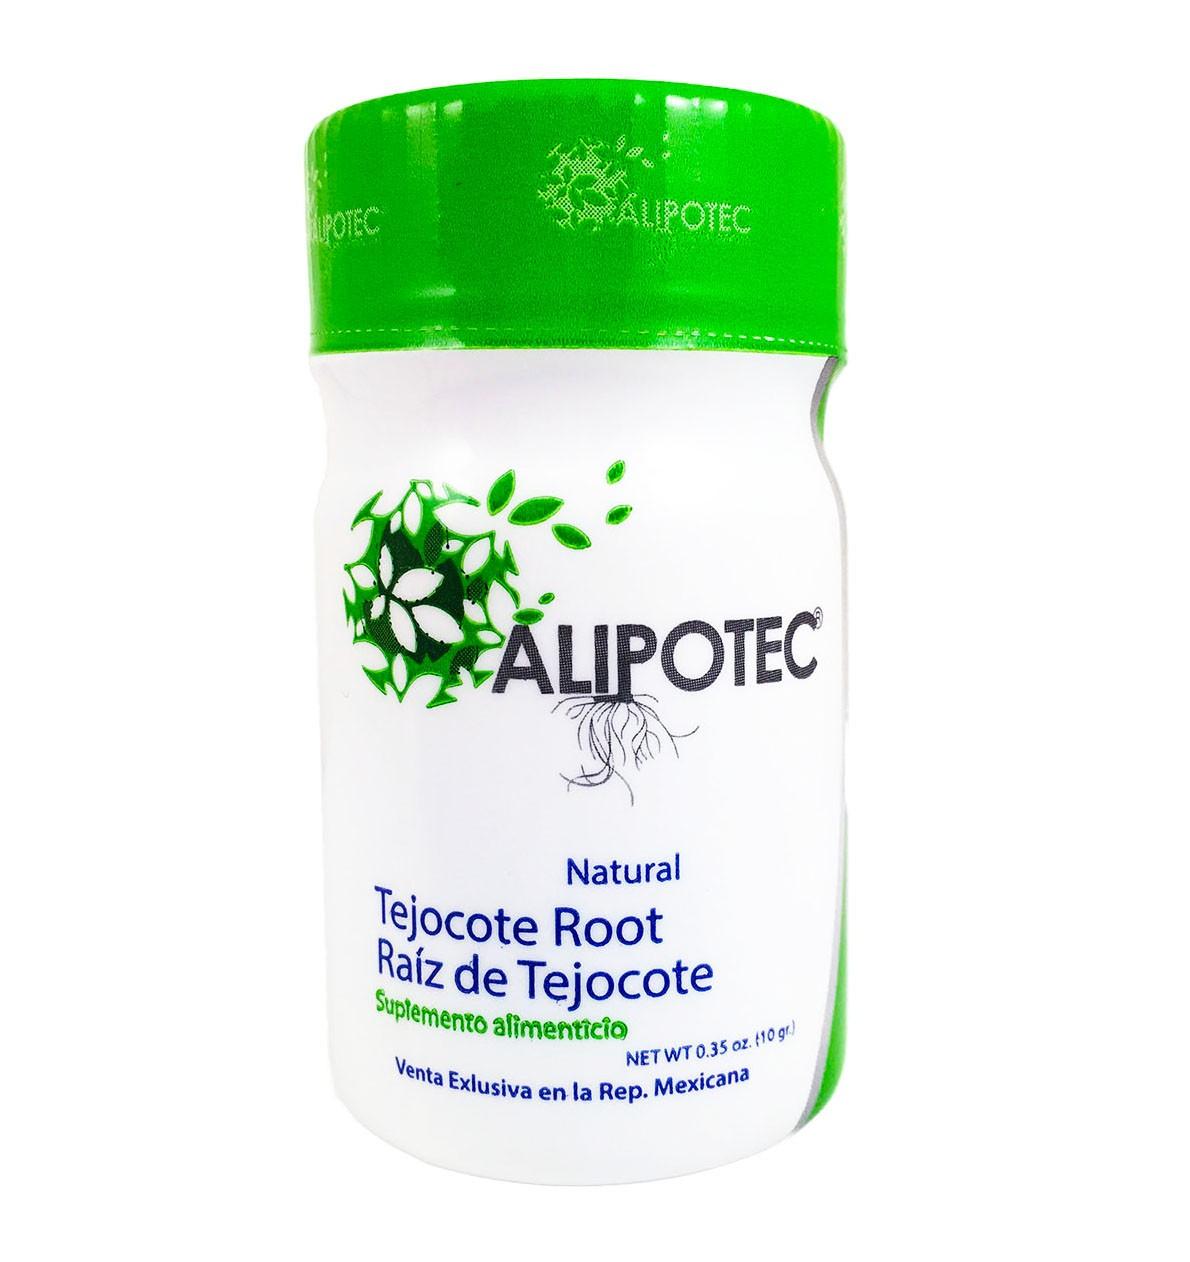 Alipotec Raiz de Tejocote Root in USA - 90 Day Supply as ...